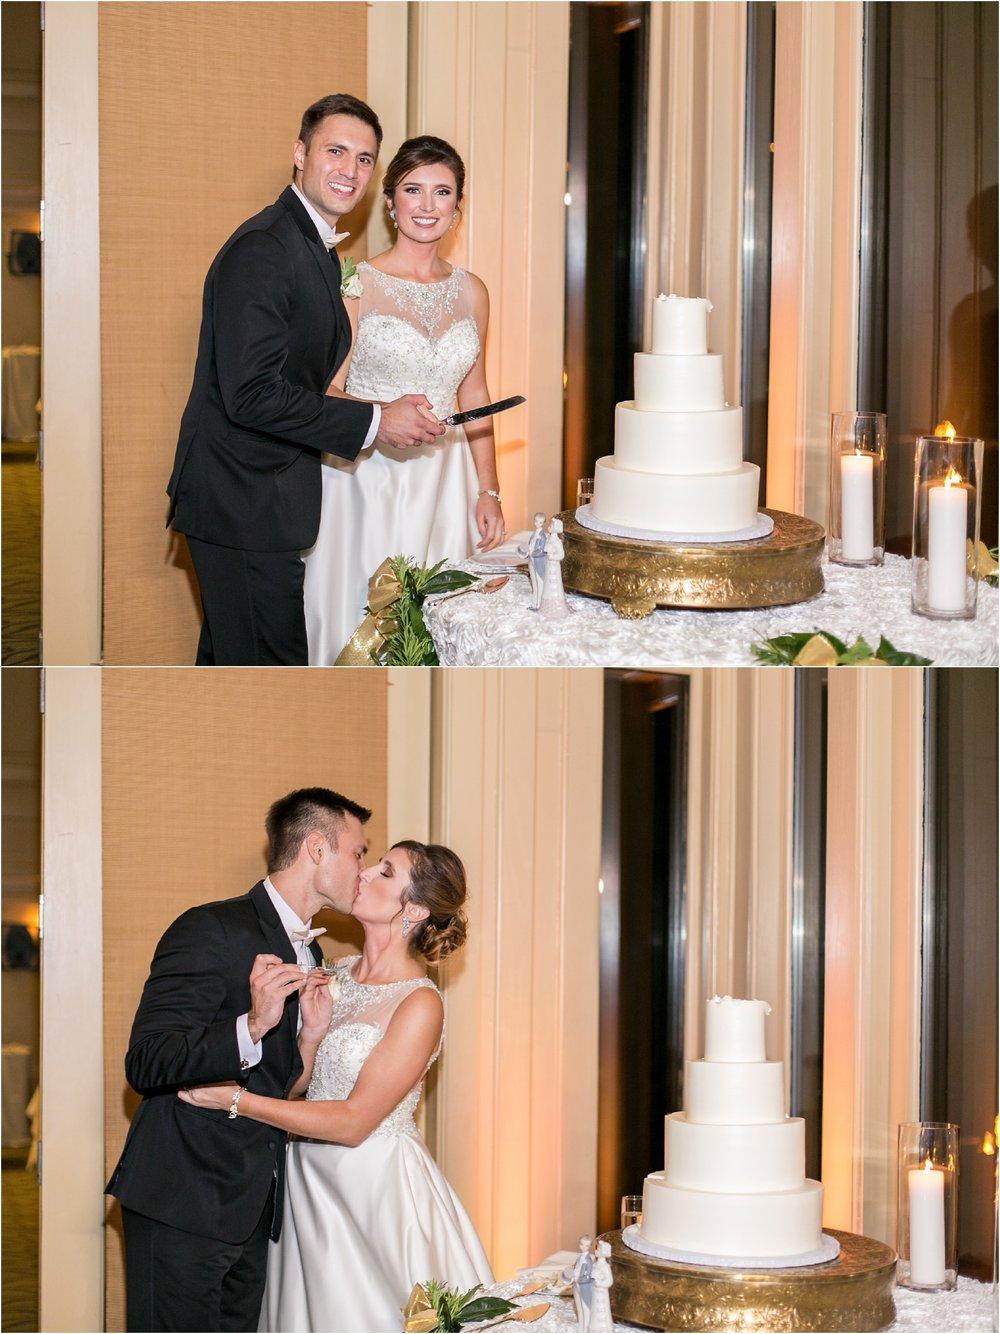 Savannah Eve Photography- Bottiglion-Scope Wedding- Sneak Peek-97.jpg